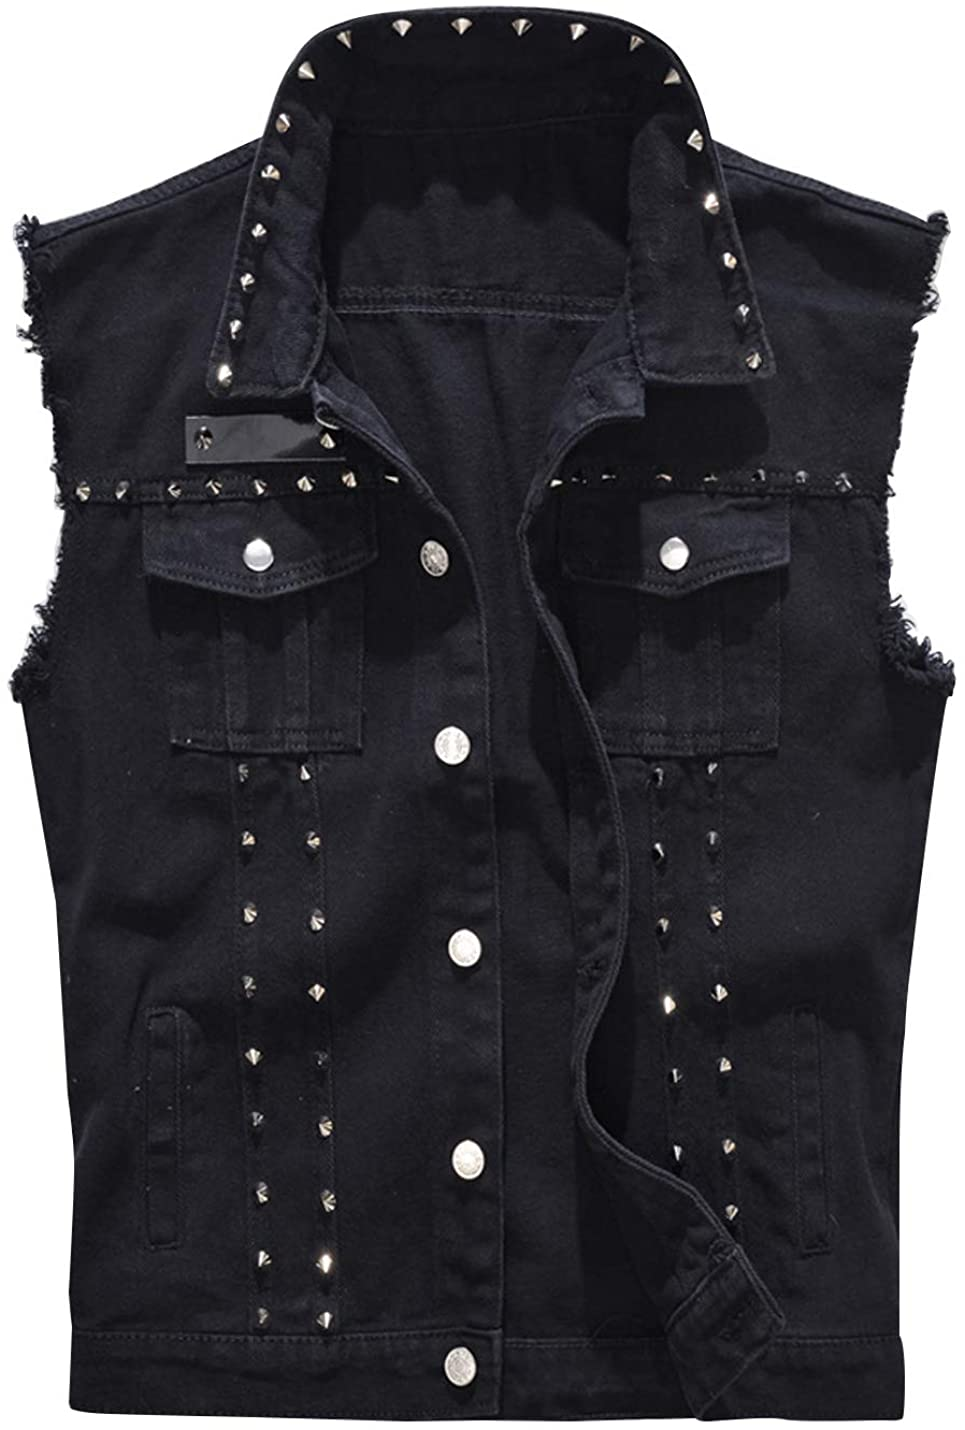 HUPOO Men's Trendy Punk Denim Vests Lapel Studded Rivets Frayed Jean Jackets Waistcoats Gilet